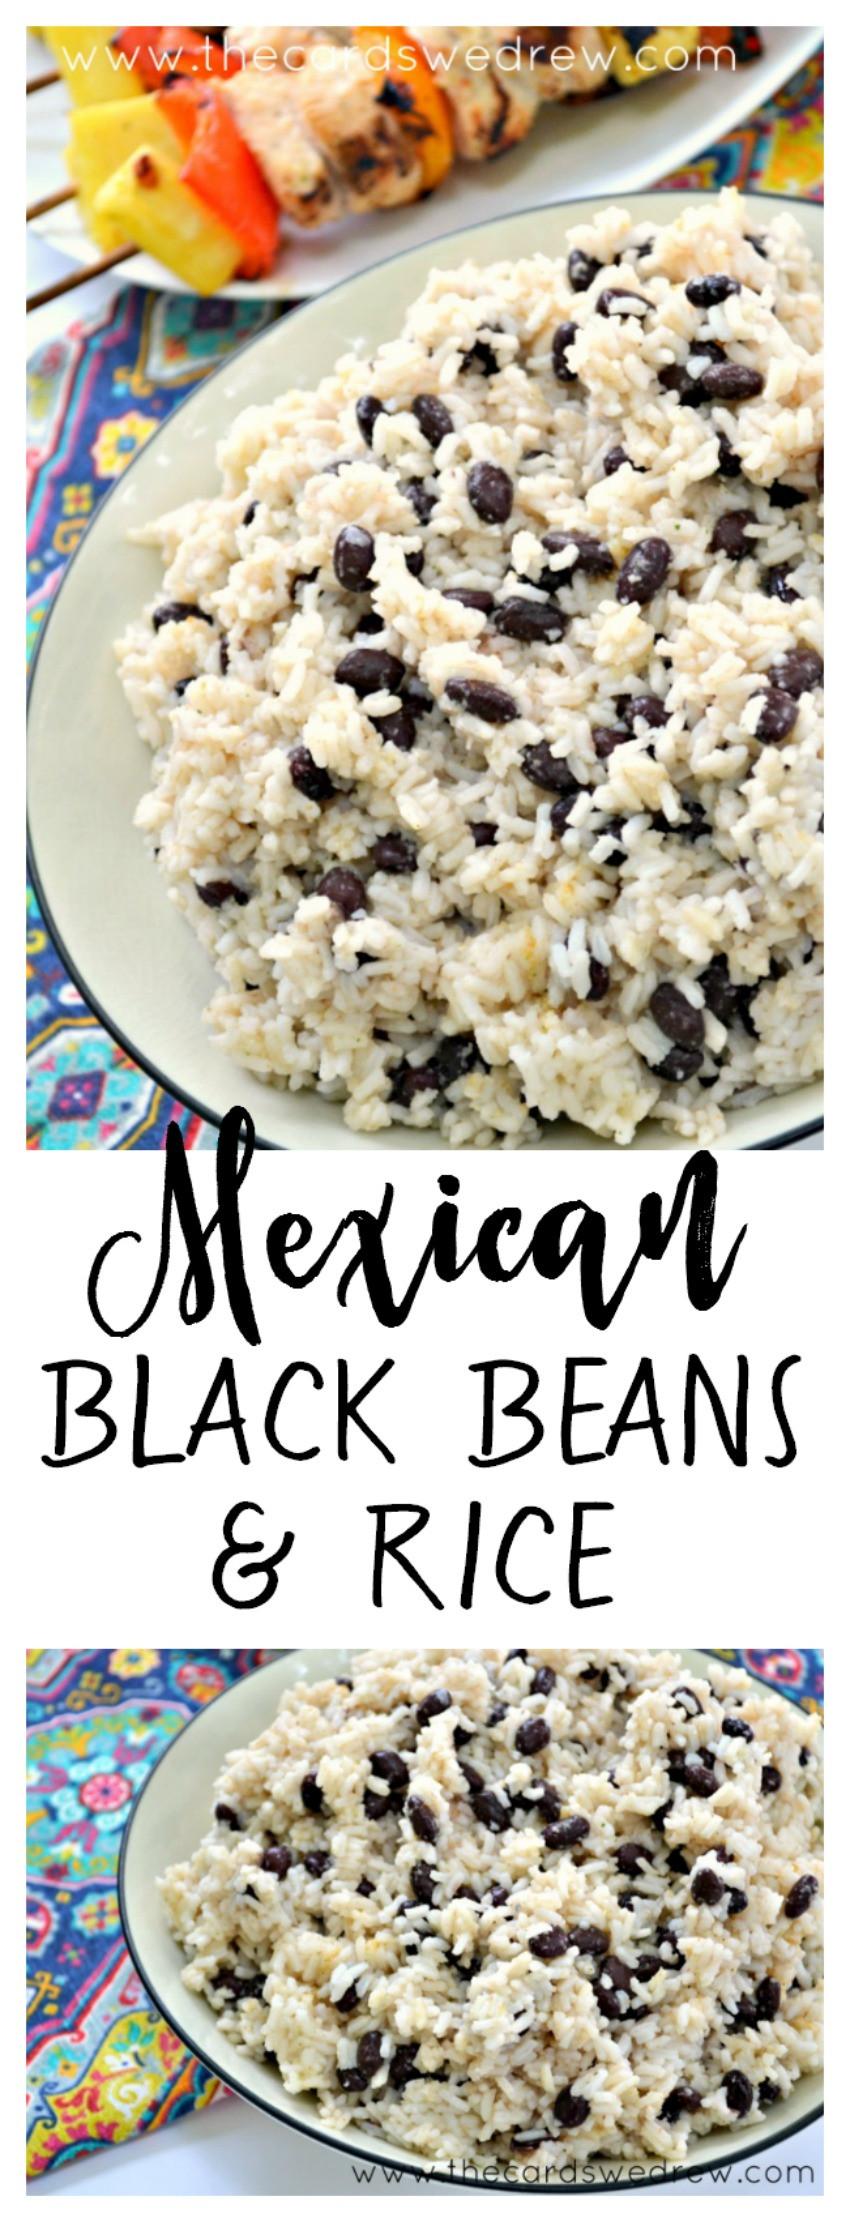 Easy Black Beans And Rice  Easy Black Beans and Rice Recipe